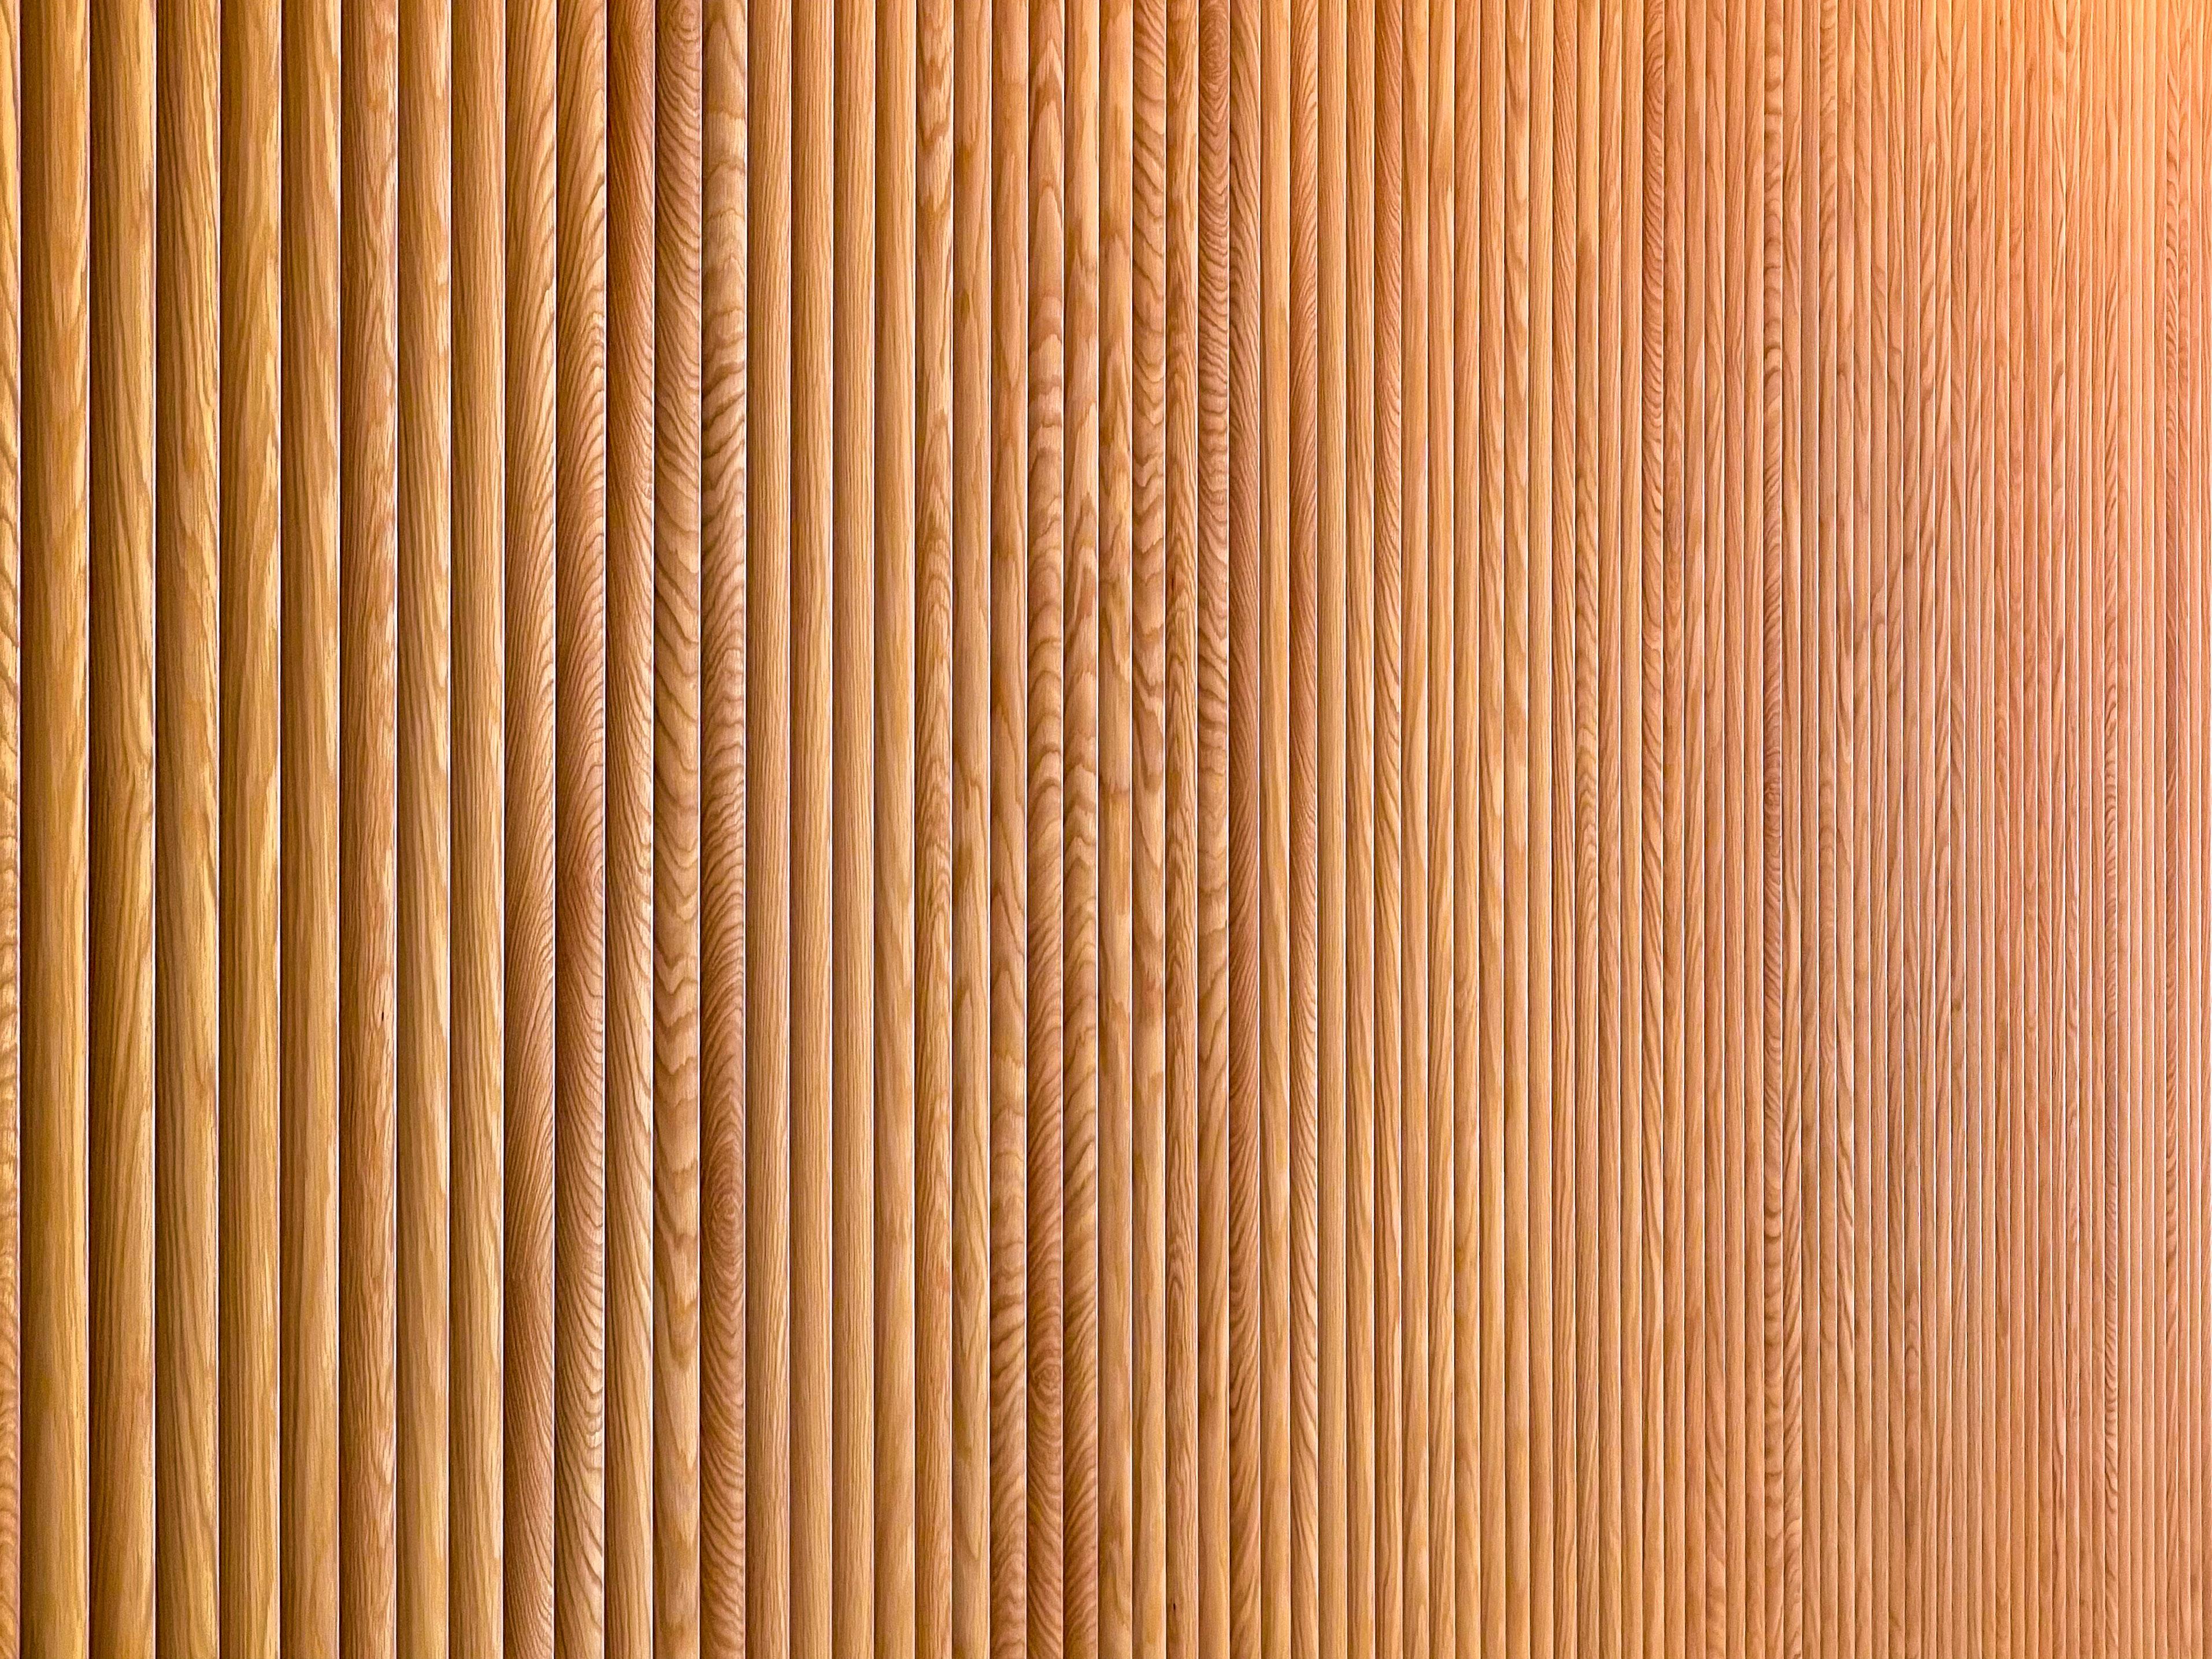 Mark Richie Woodworking Slat Walls, Arup Acoustic Design